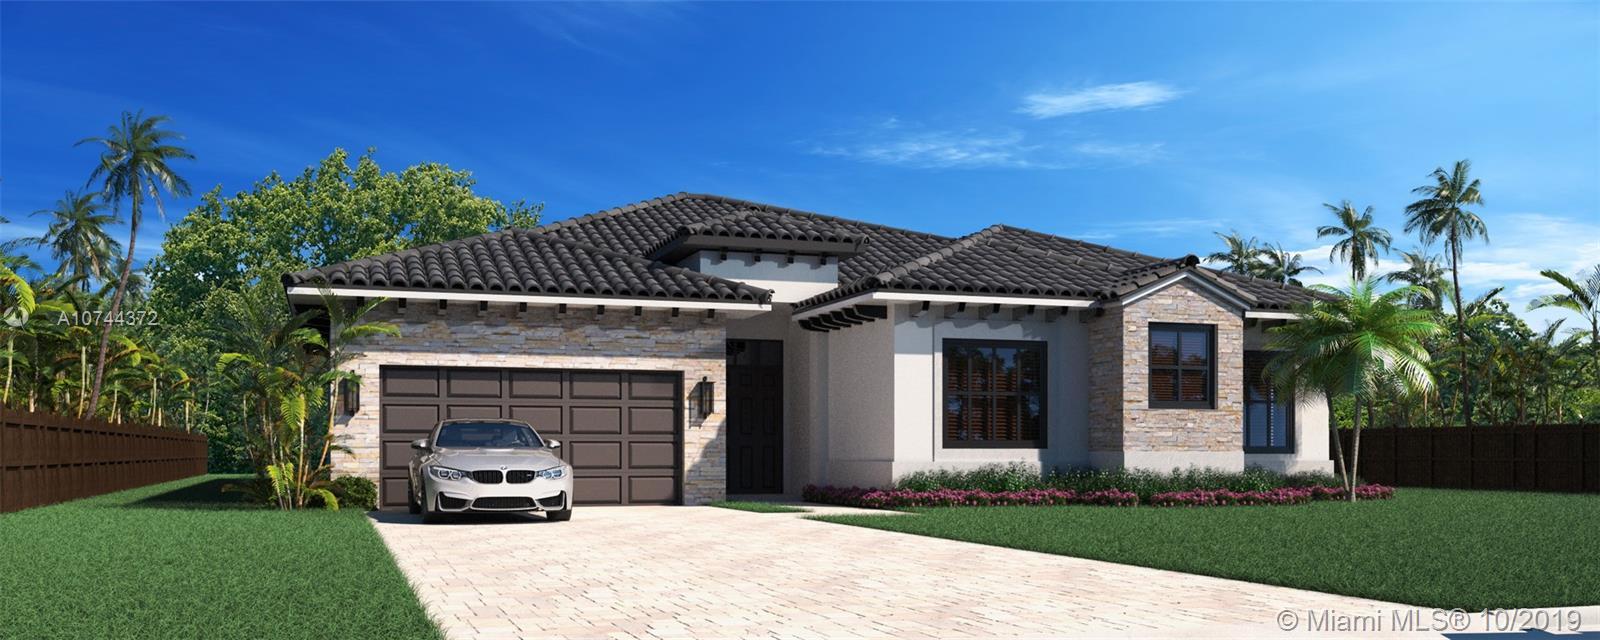 29603 SW 169 Ave, Homestead, Florida